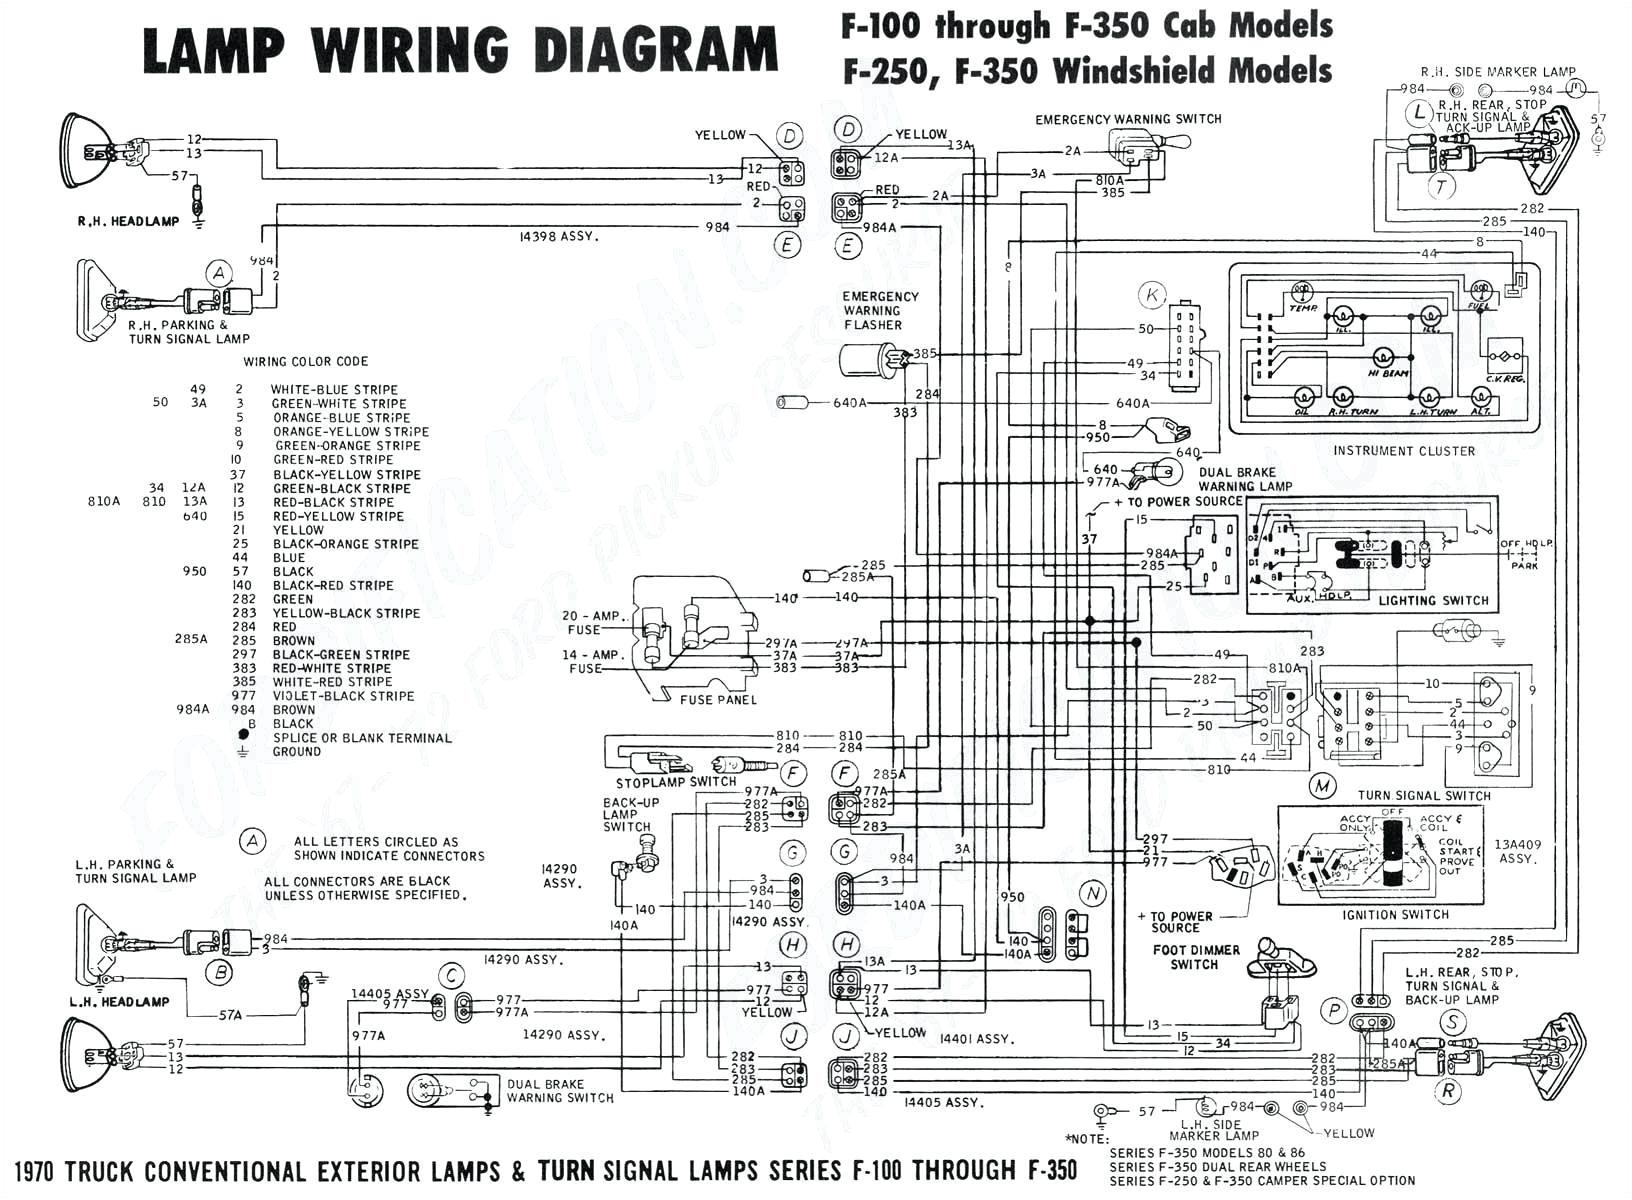 ford 5 8l engine diagram wiring diagram yer 1997 ford 5 8 engine diagram wiring diagram